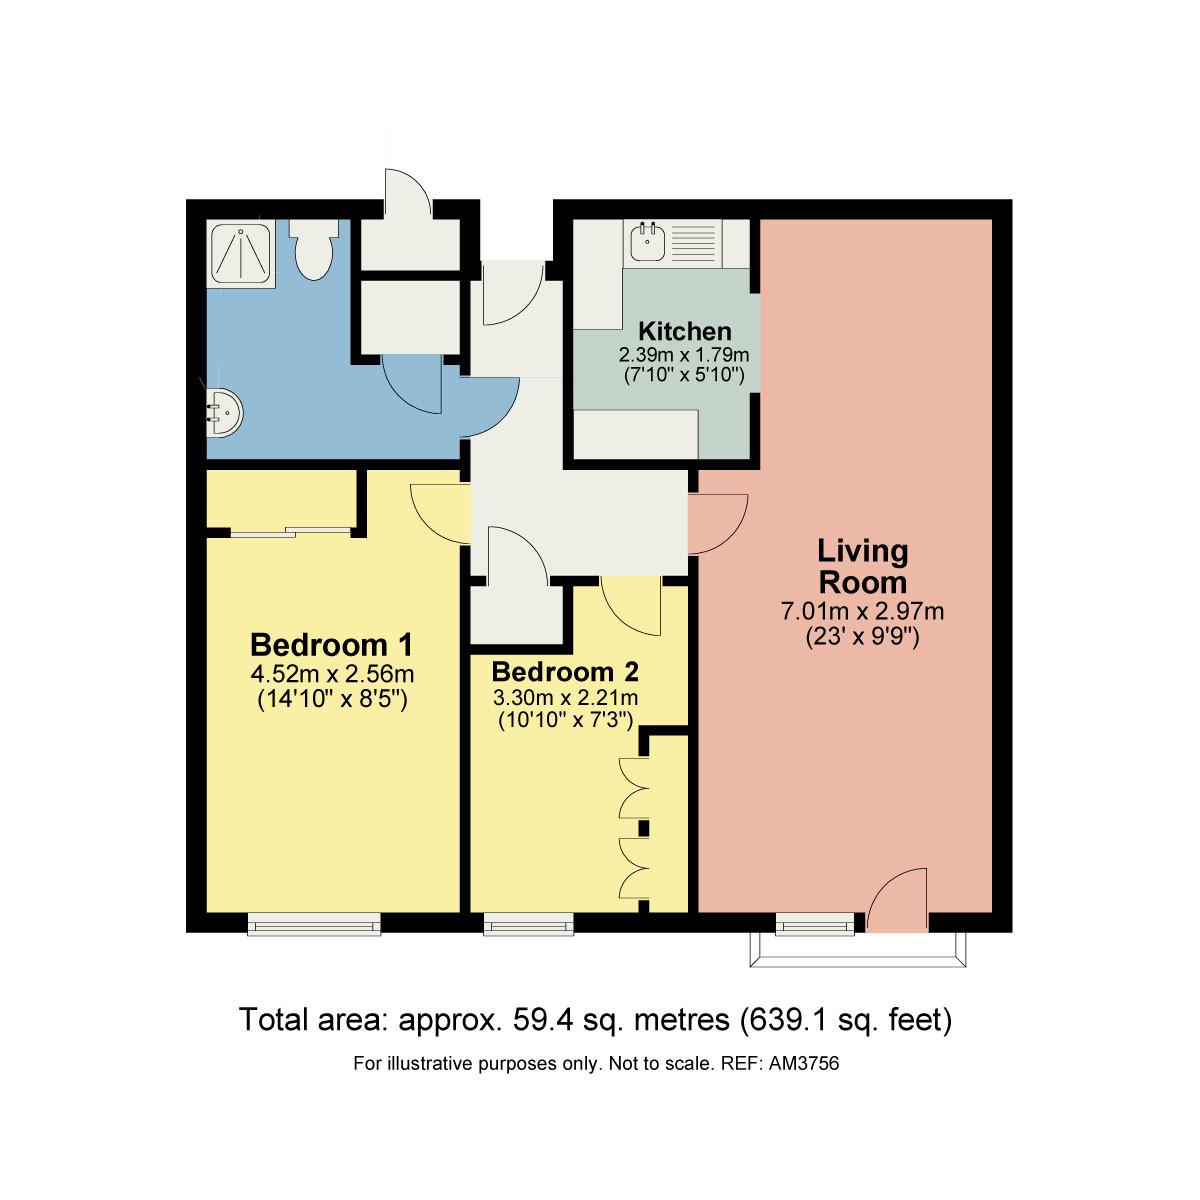 Floorplan 211 Millans Court, Ambleside, Cumbria, LA22 9BW